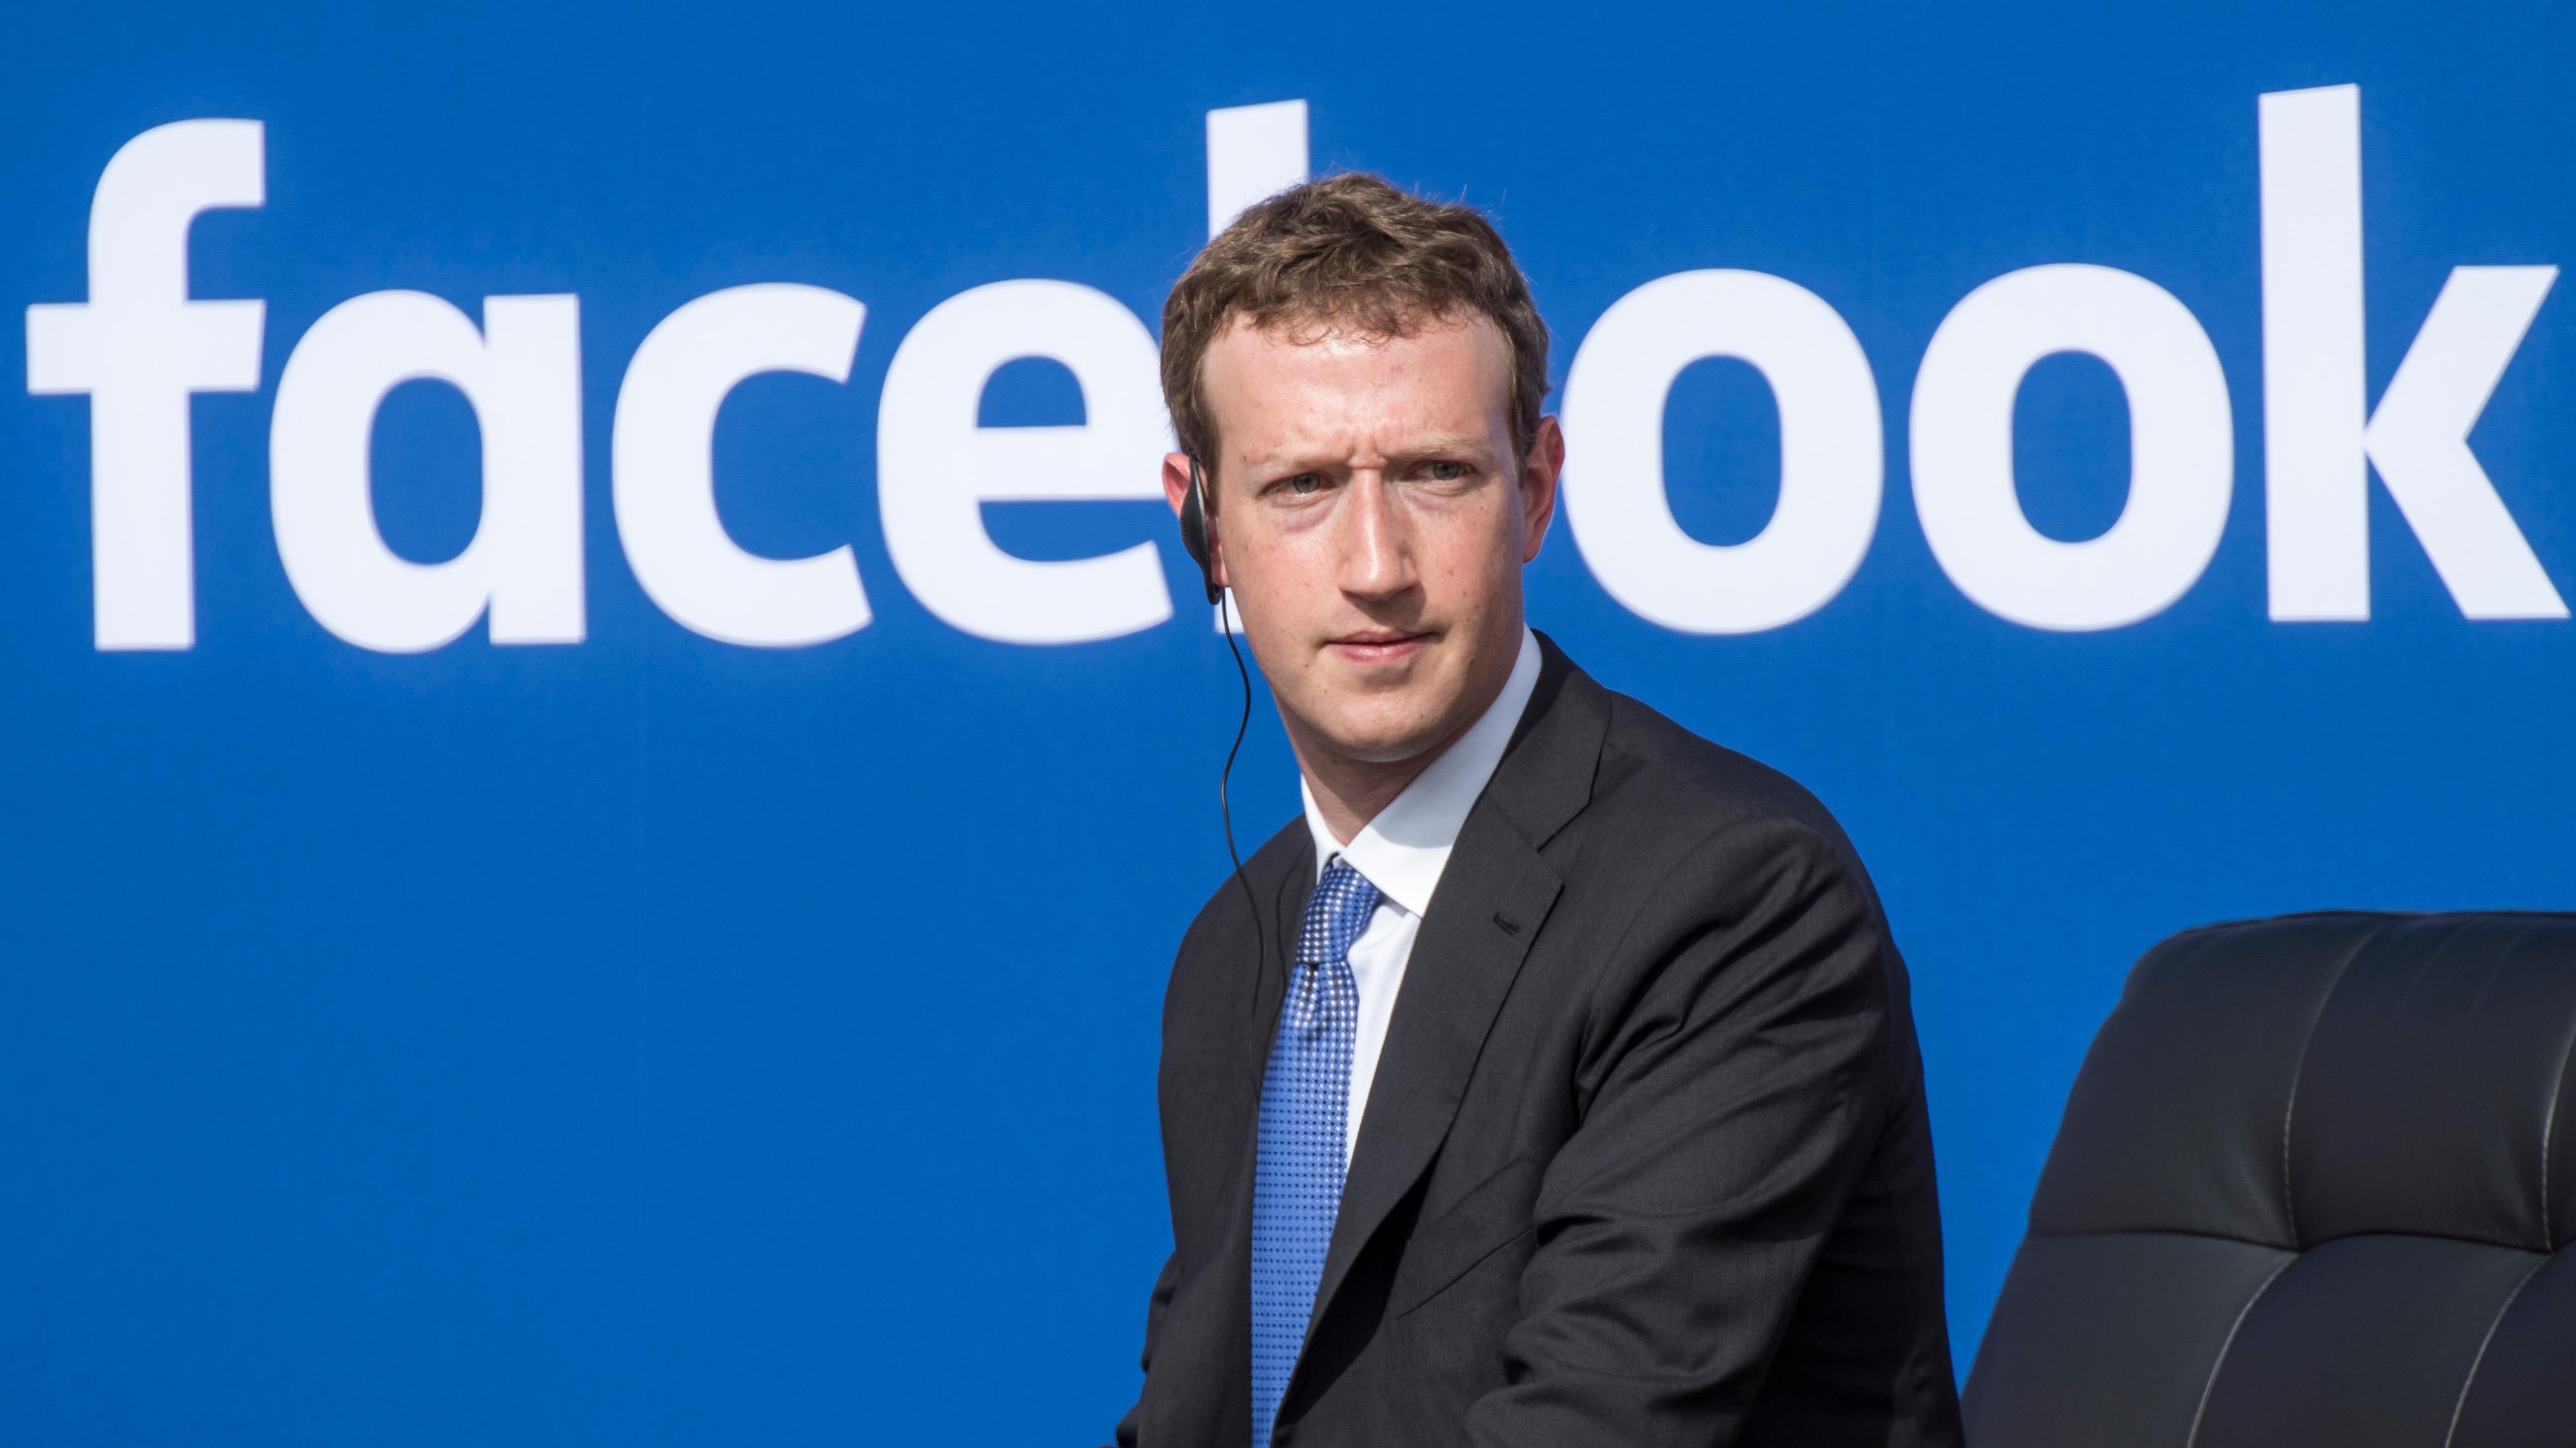 Mark Zuckerberg, Facebook, Harvard, Times, Forbes, New York, charity, Microsoft, India, NewsMobile